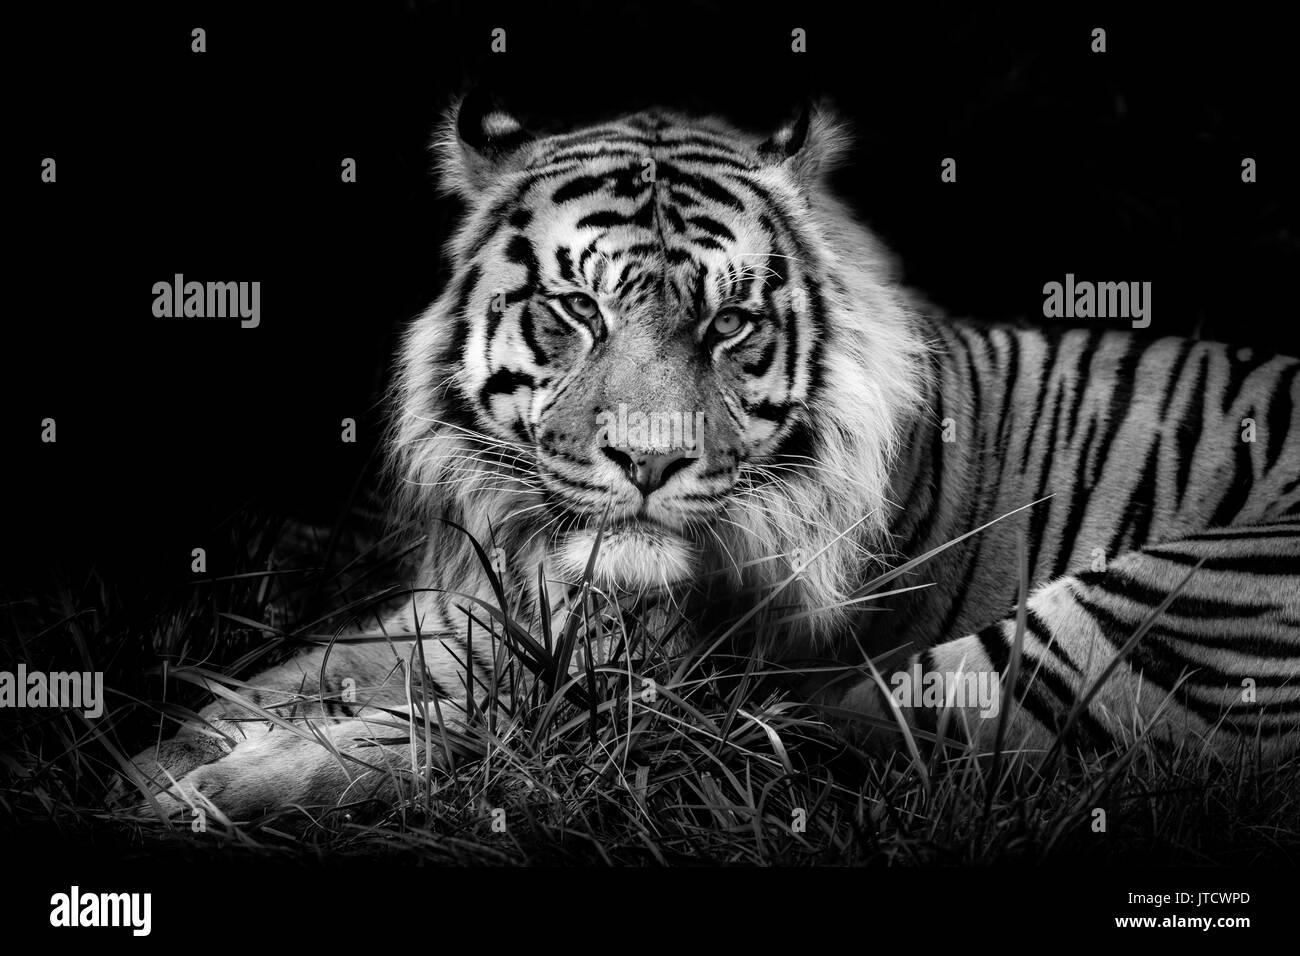 Male Sumatran Tiger against a black background - Stock Image